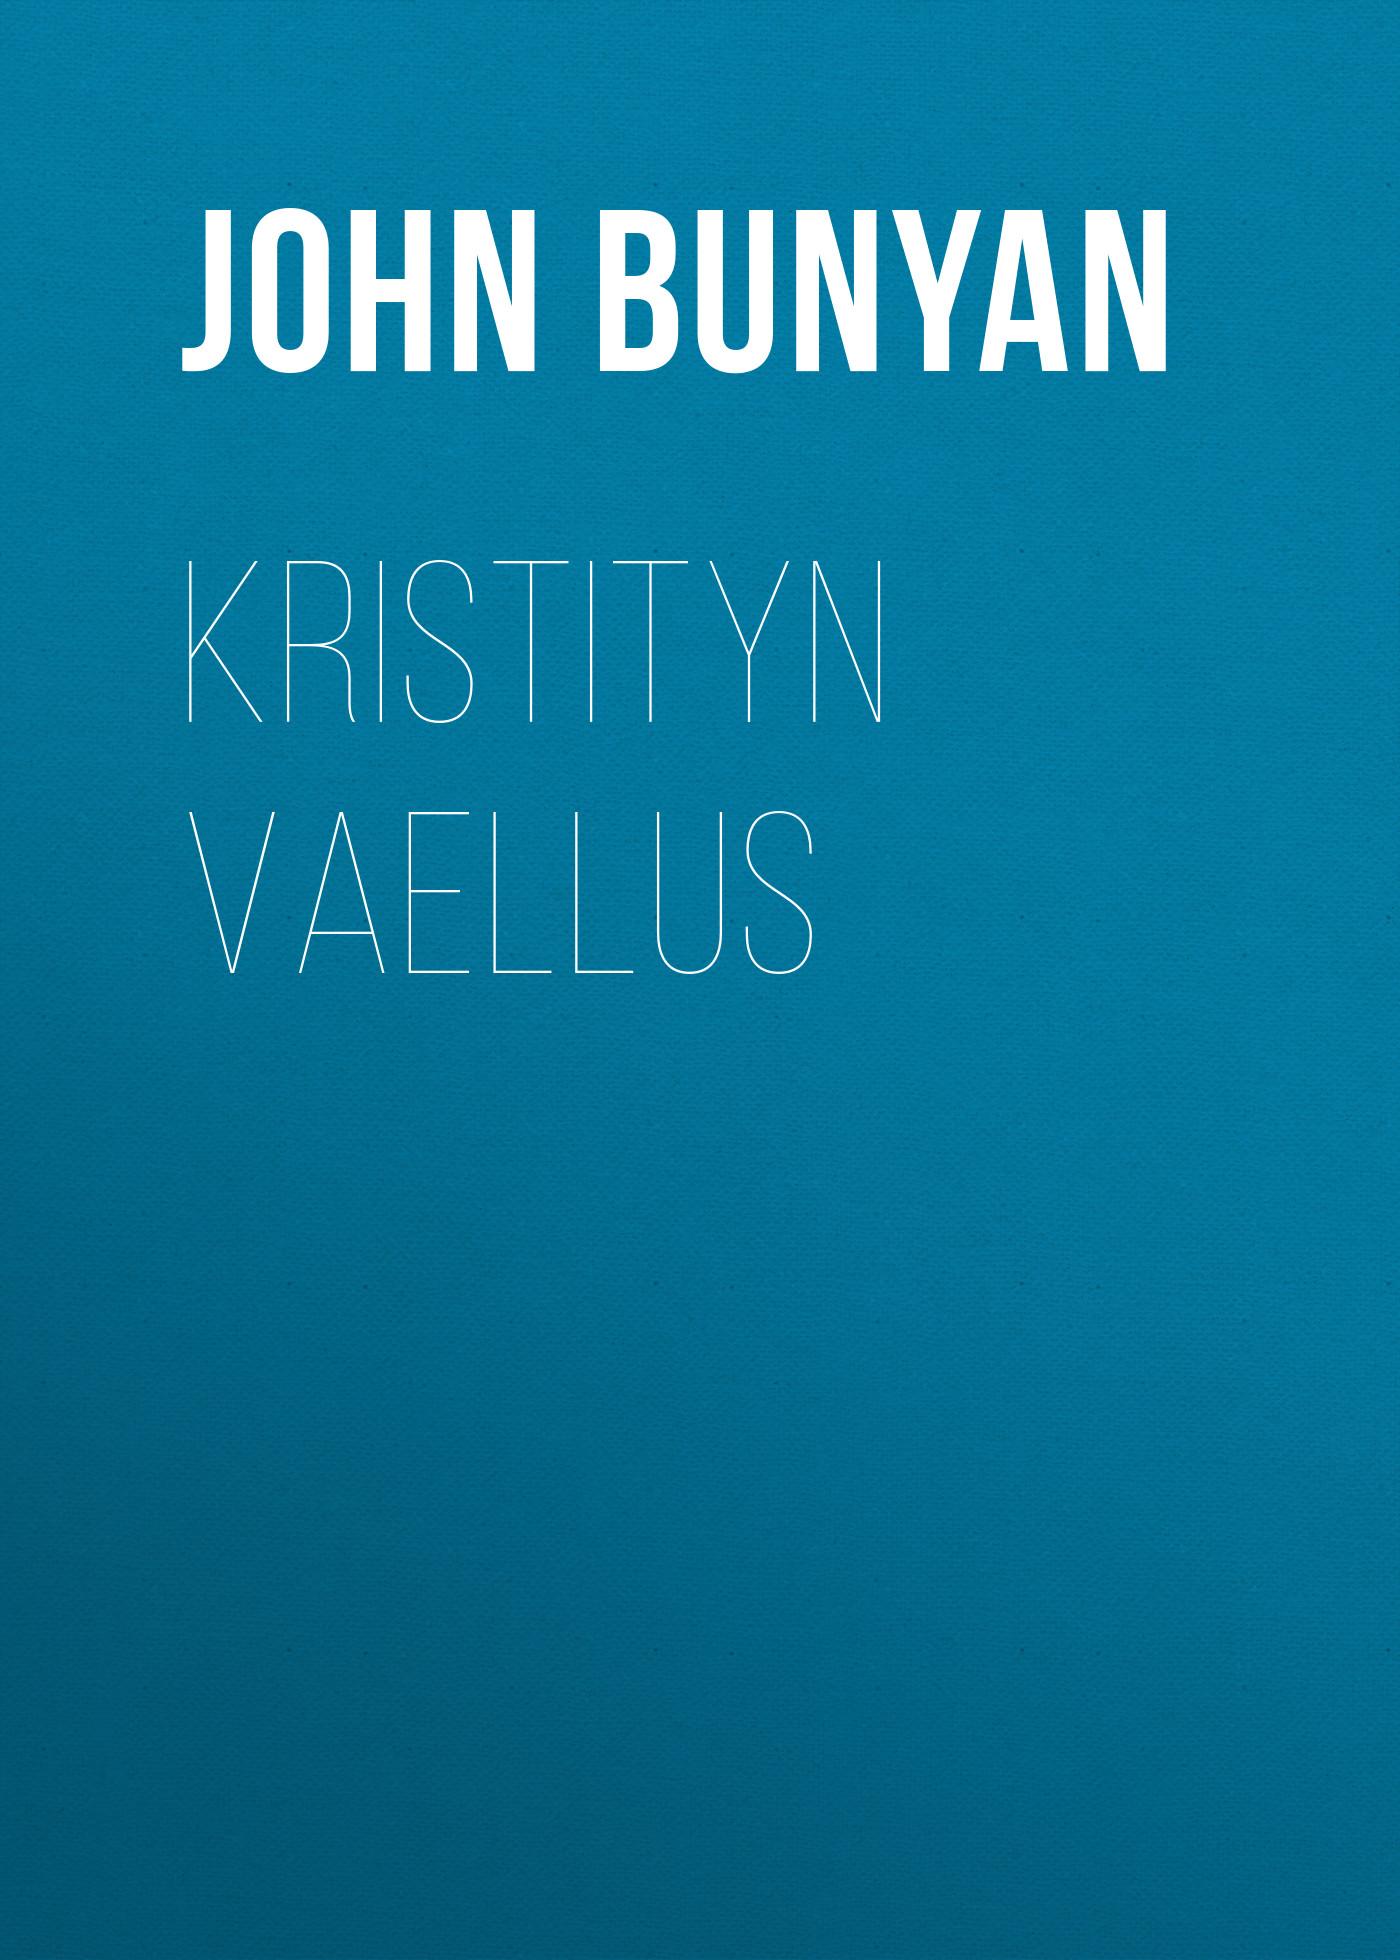 John Bunyan Kristityn vaellus